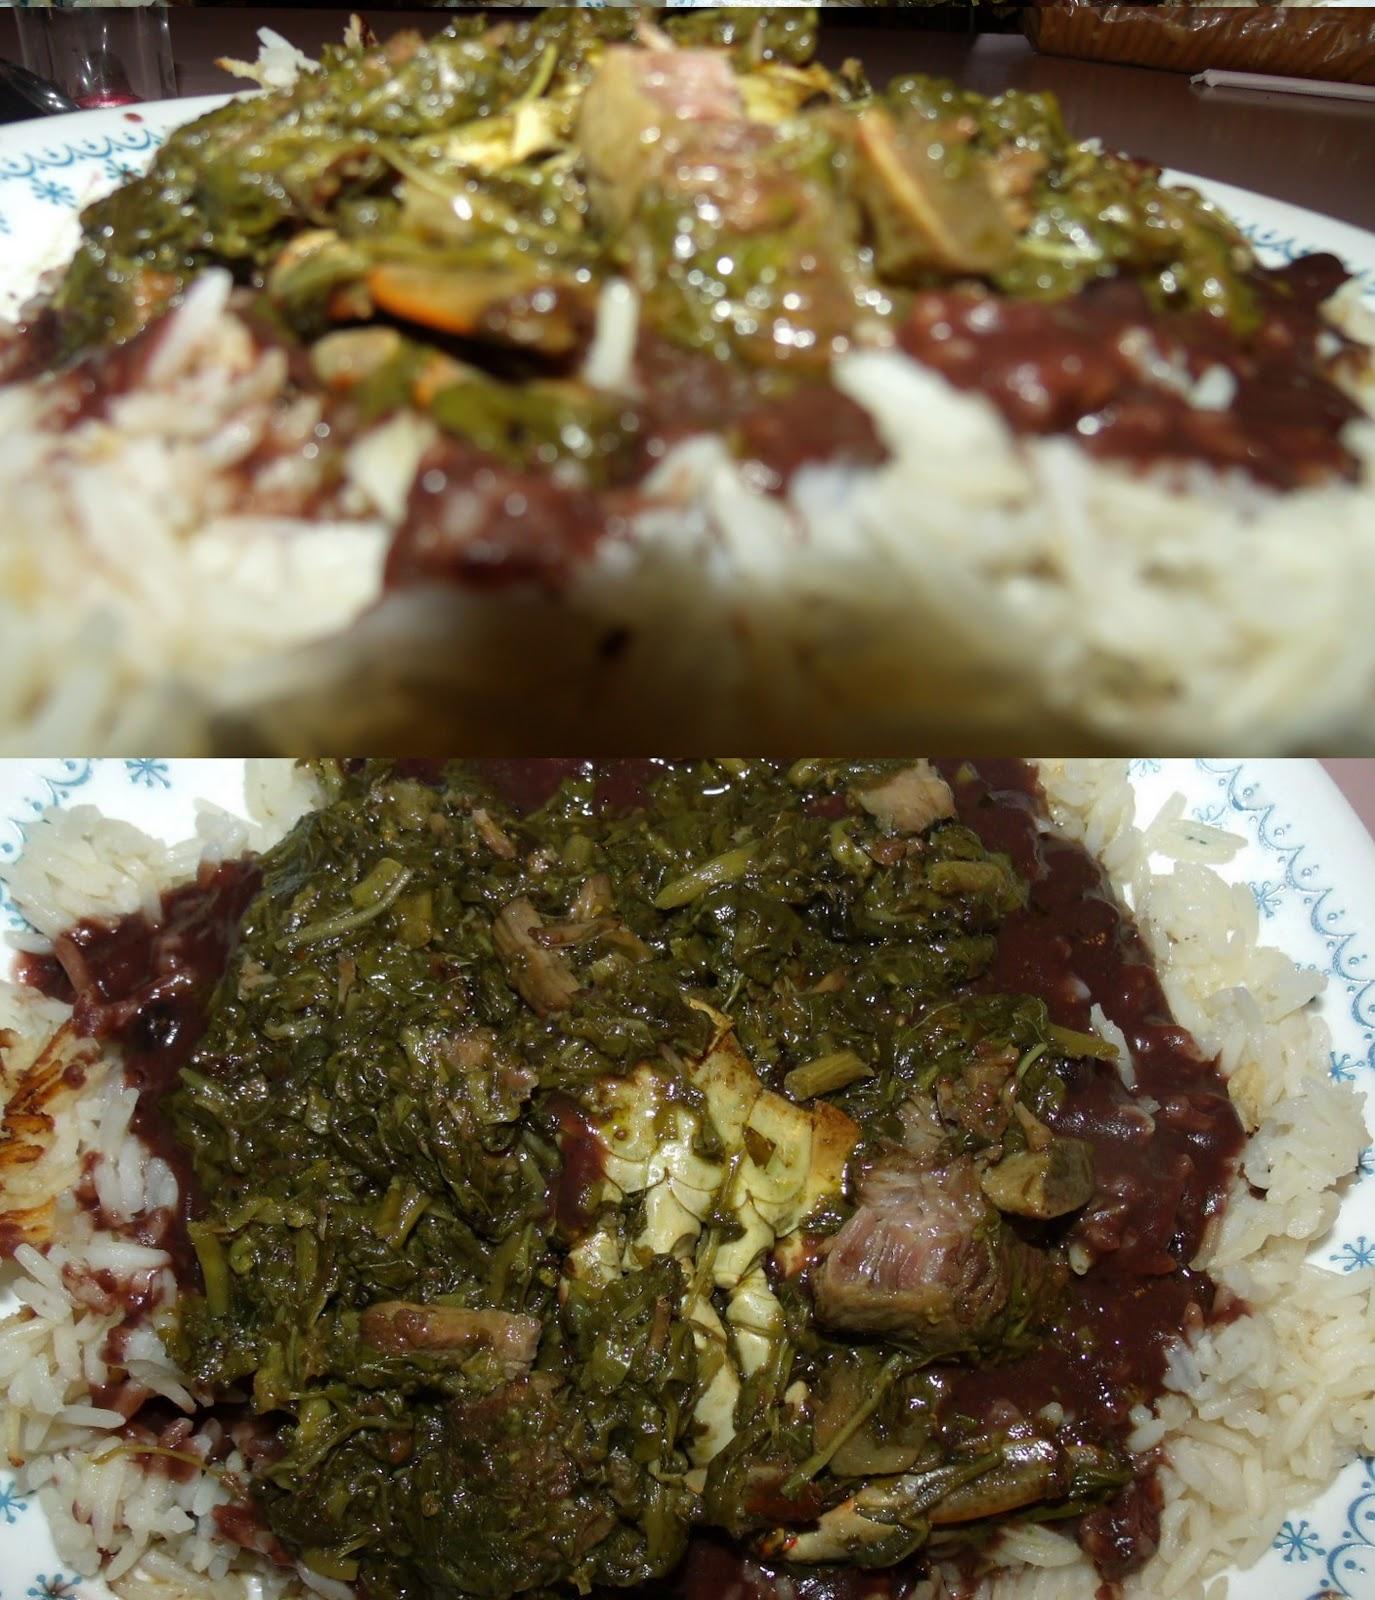 Haitian Food Legume My Haitian Plate: Lalo...